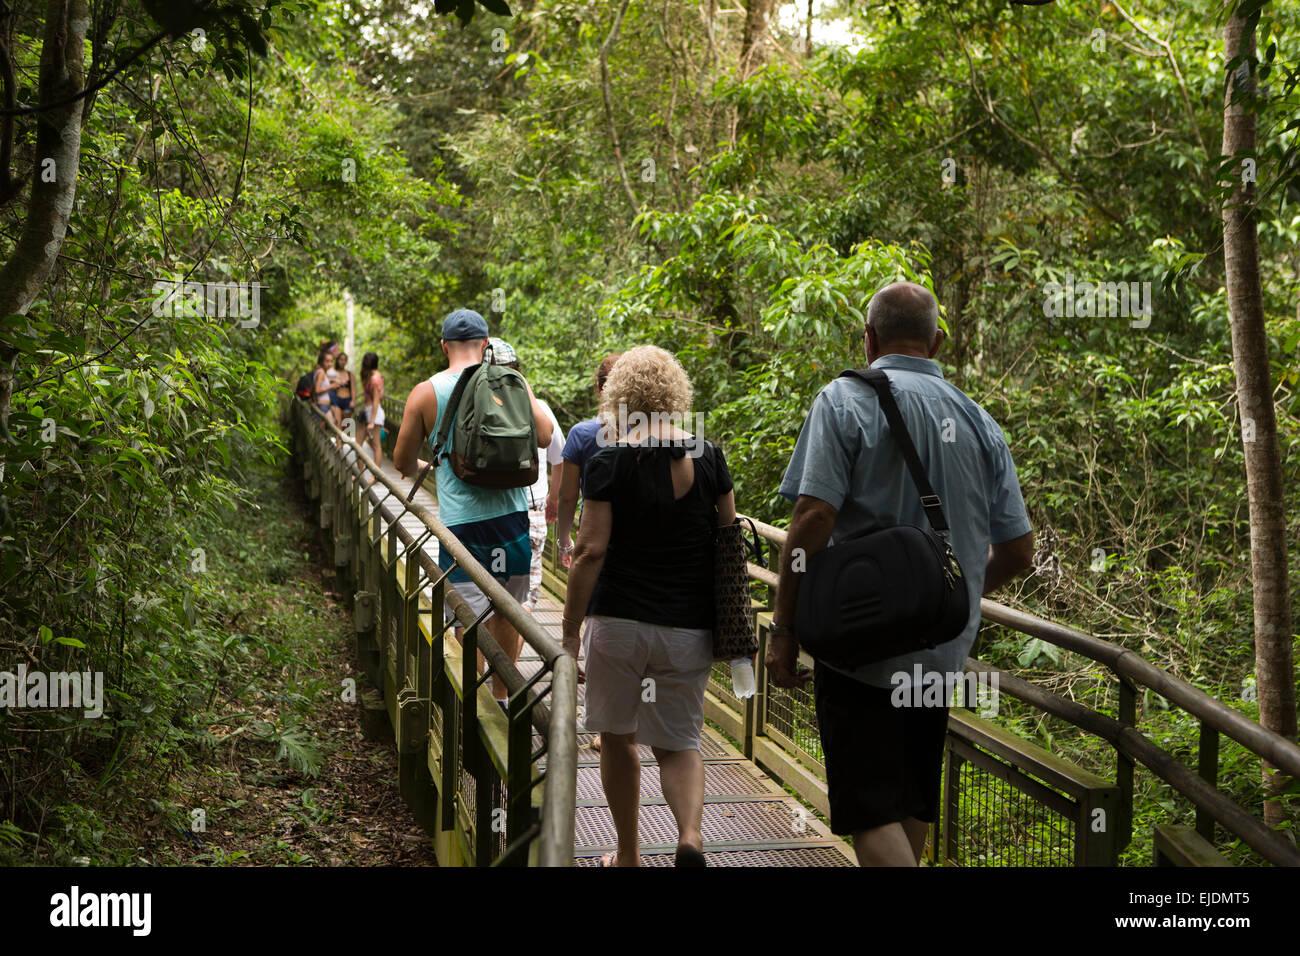 Argentina, Iguazu Falls, tourists on Circuito Inferior, lower circuit walkway - Stock Image